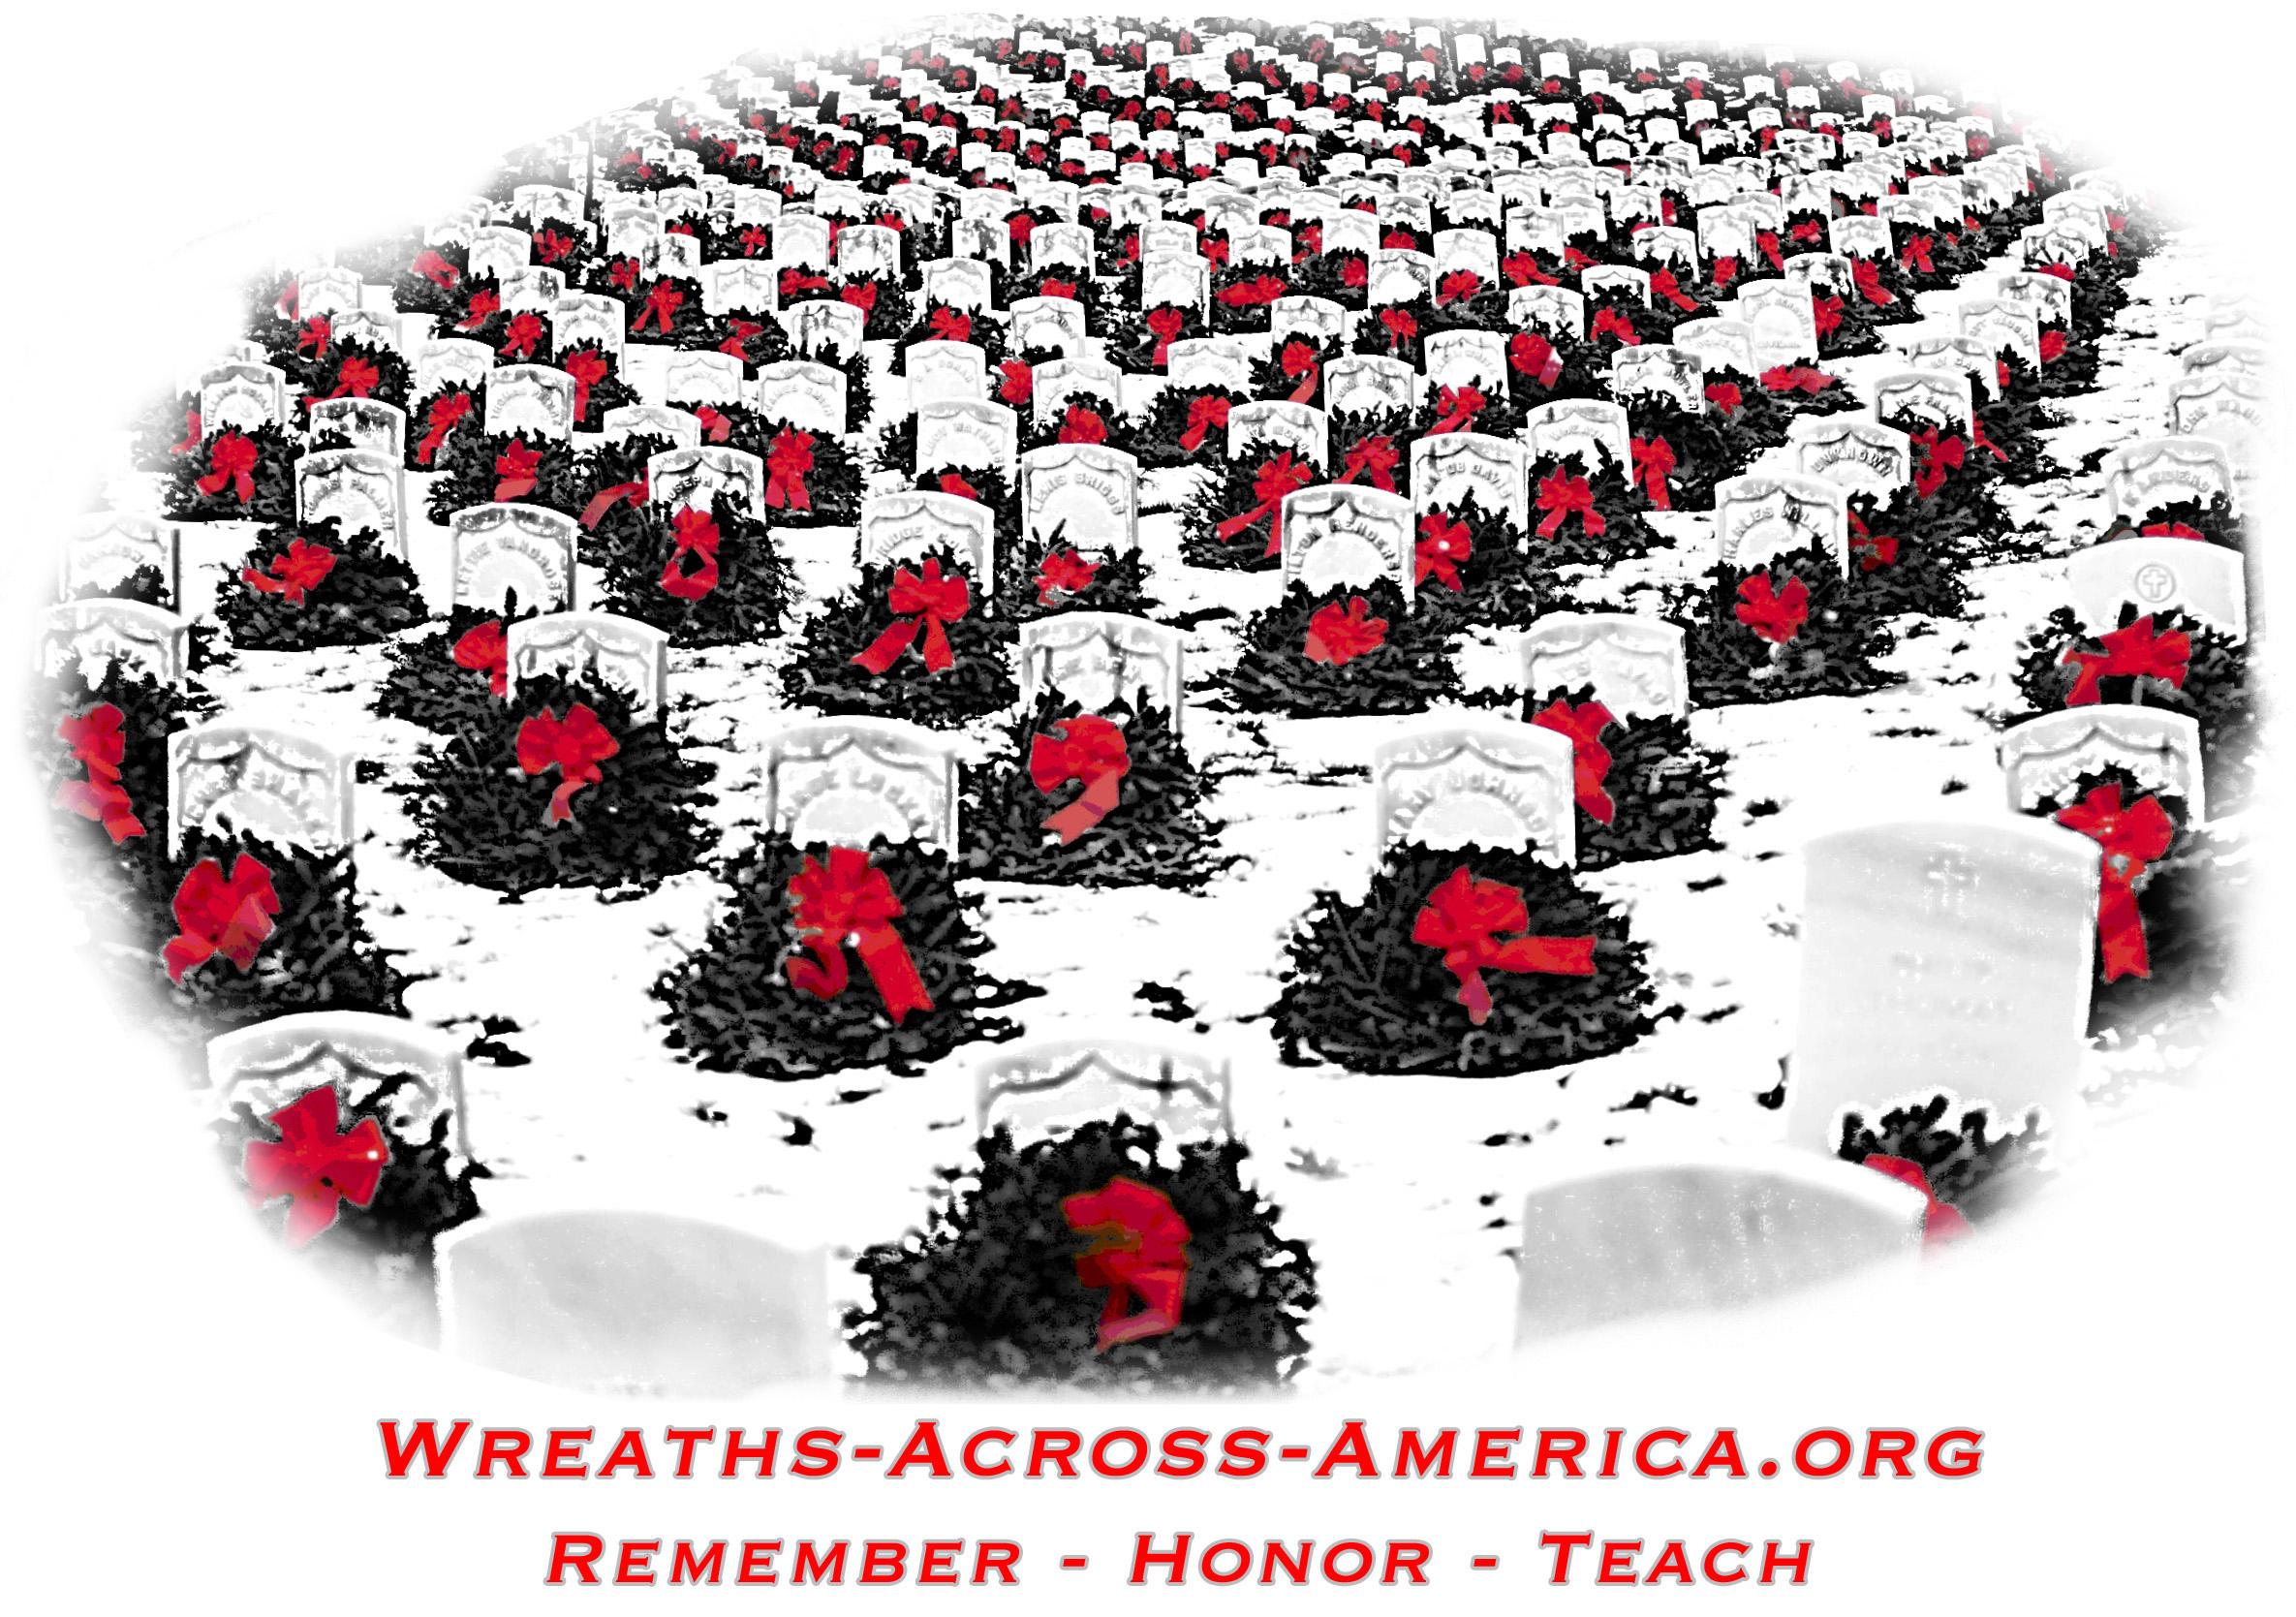 Civil Air Patrol to Honor Veterans as Part of Wreath-laying Salute